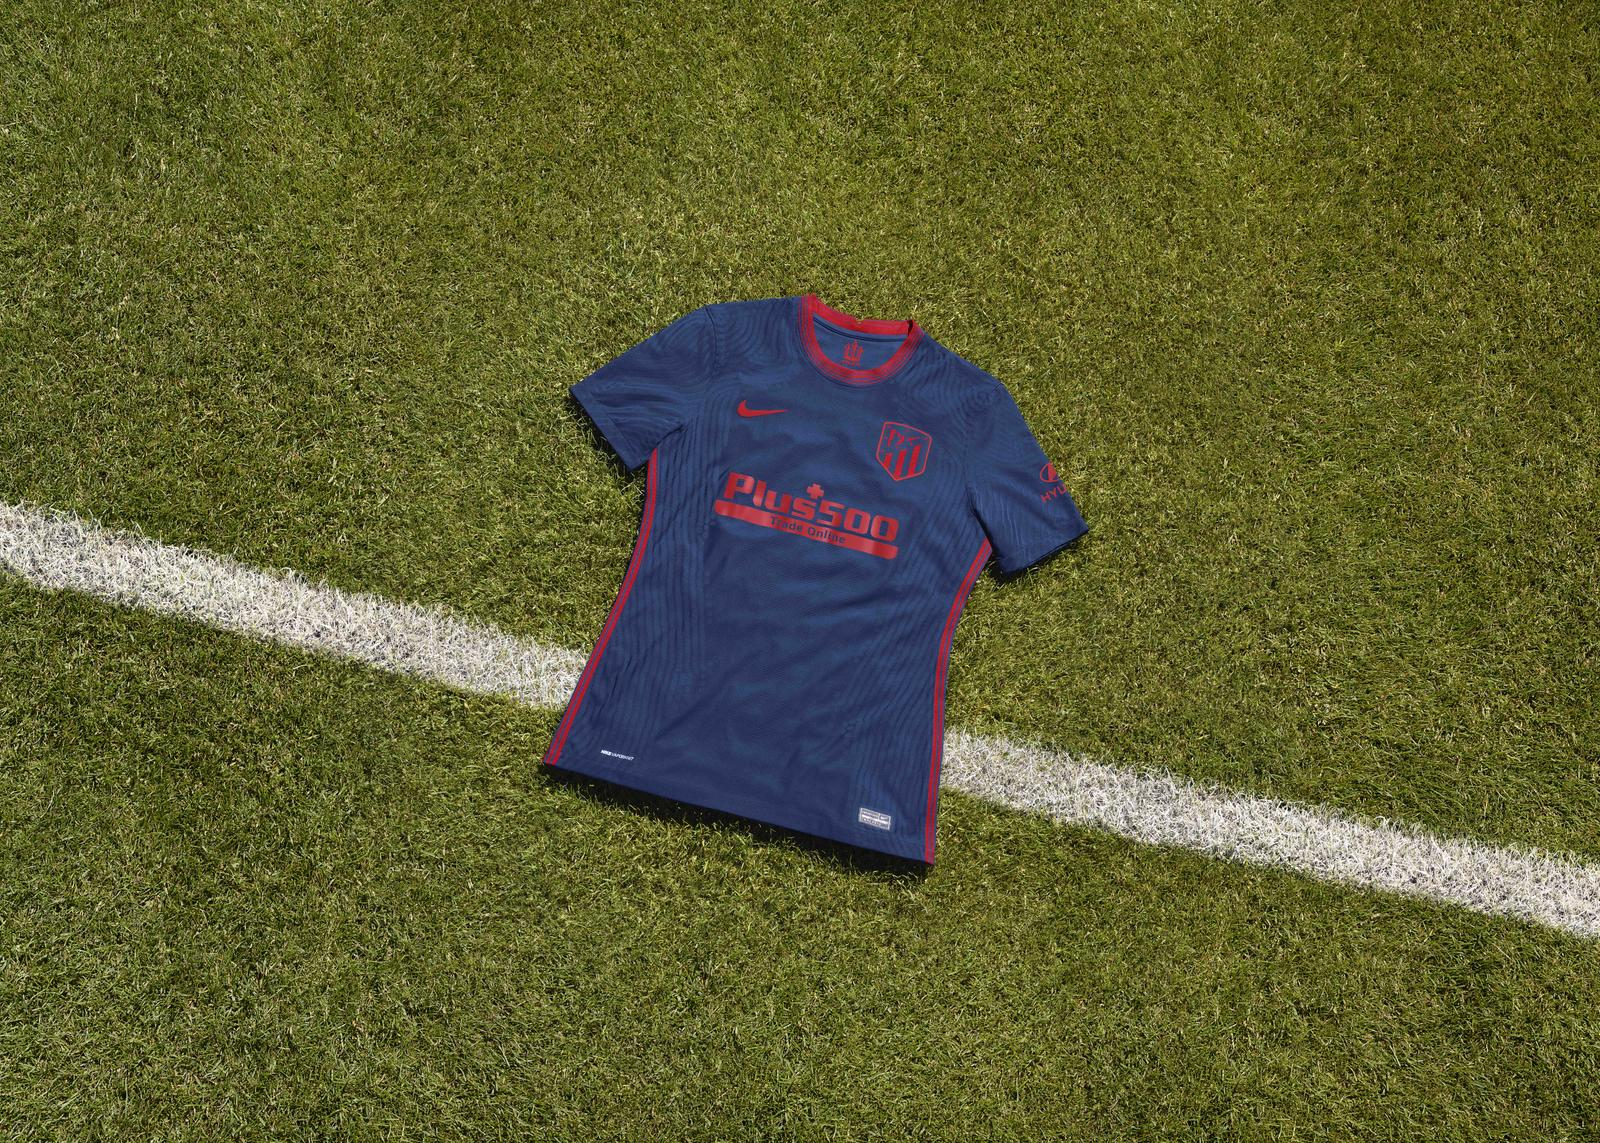 atletico-de-madrid-2020-21-away-kit